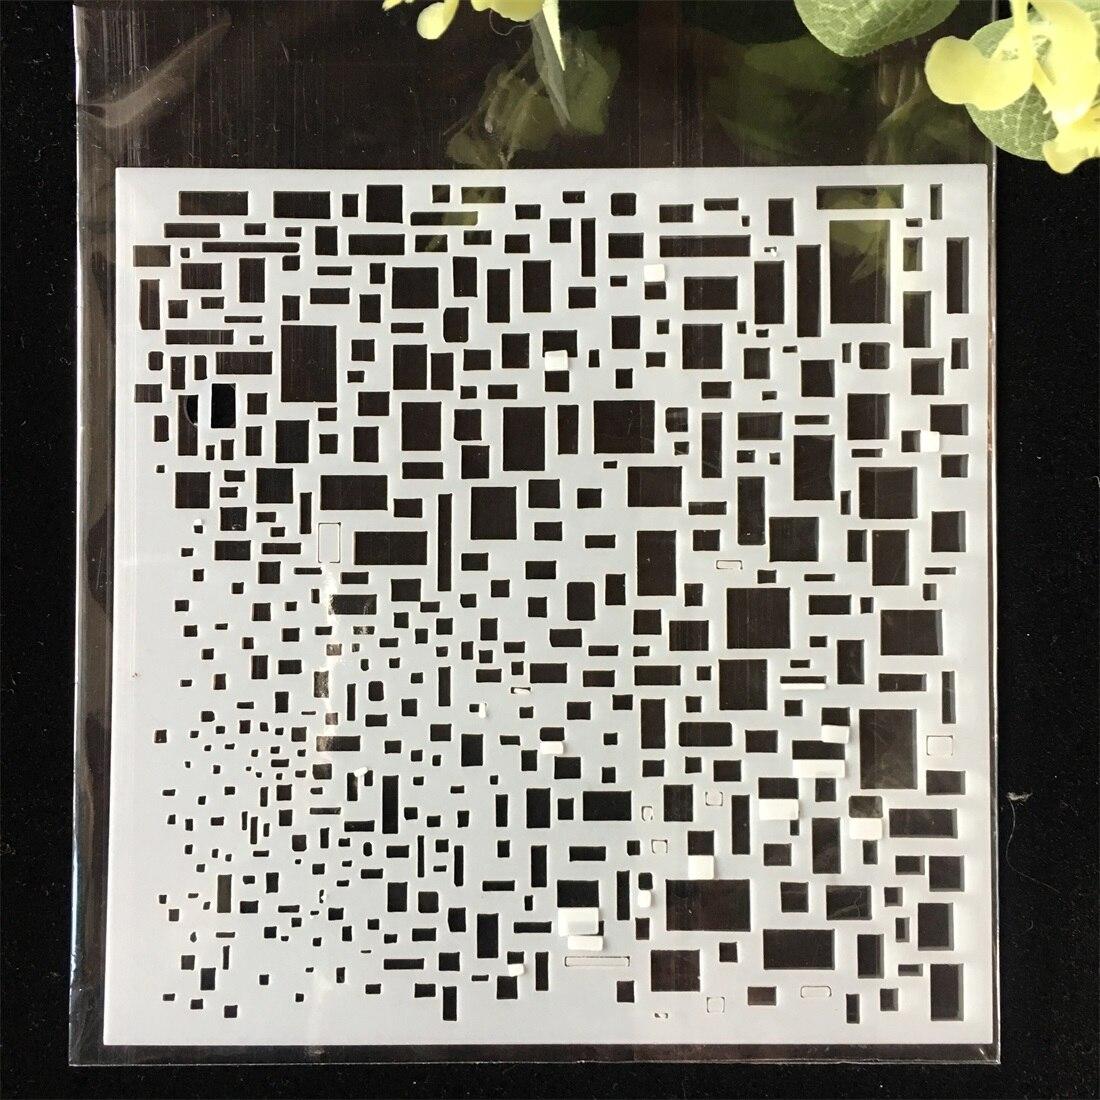 1Pcs Square Texture Block DIY Layering Stencils Wall Painting Scrapbook Coloring Embossing Album Decorative Card Template